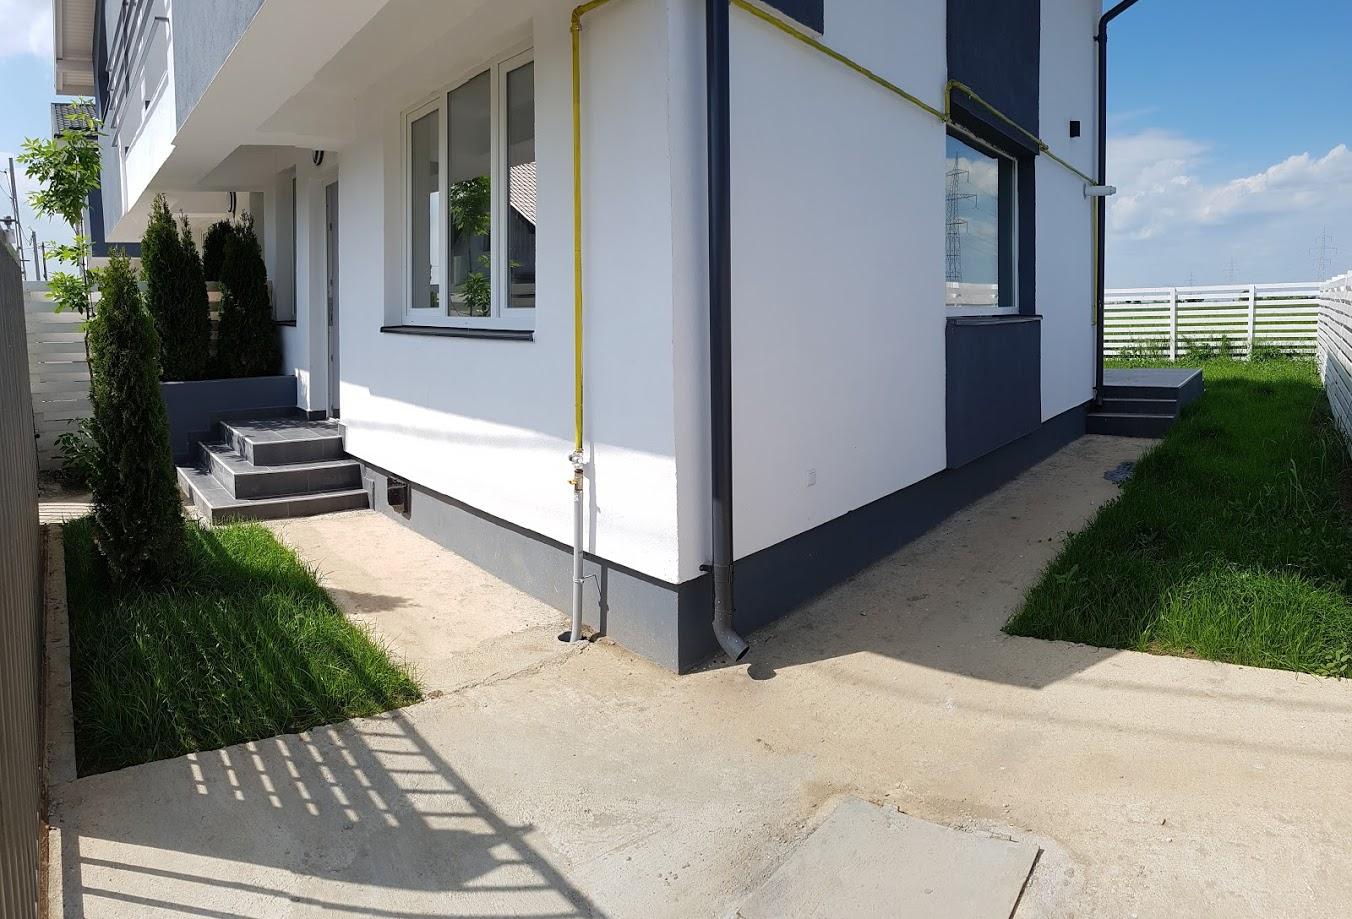 vaznare-casa-mya-residence-3-camere-2